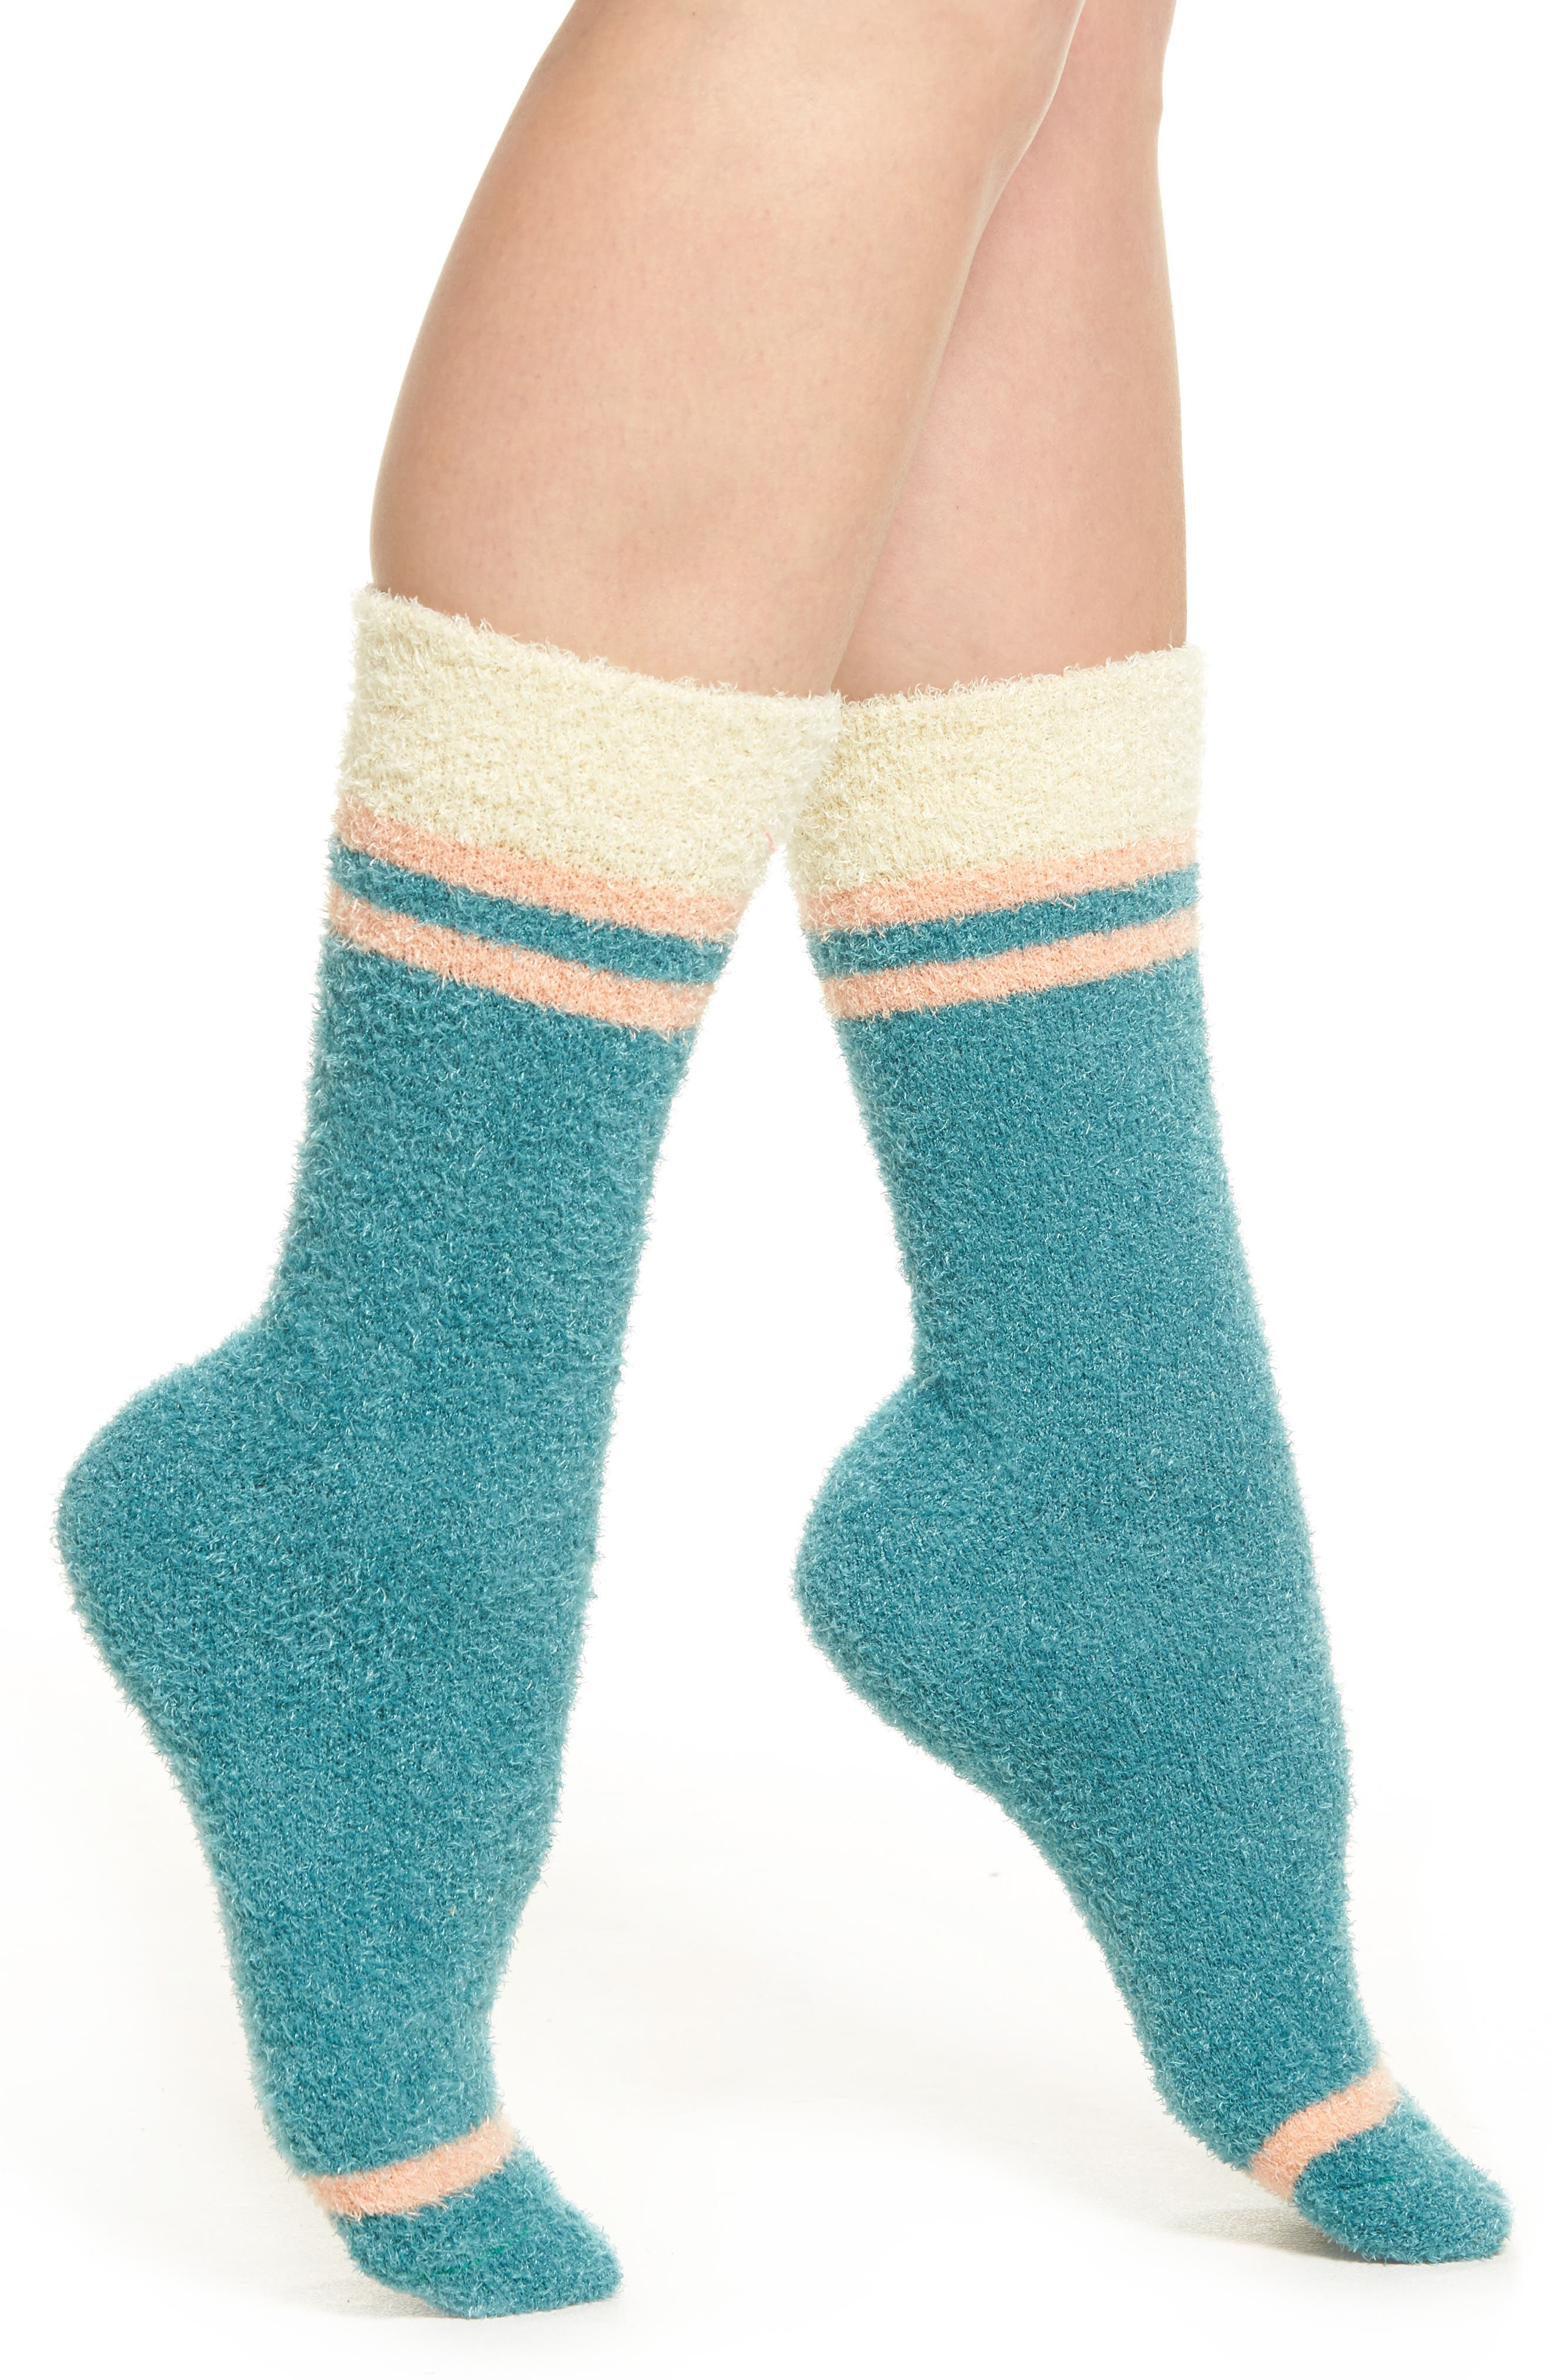 Dreamboat Slipper Socks,                         Main,                         color, Turquoise